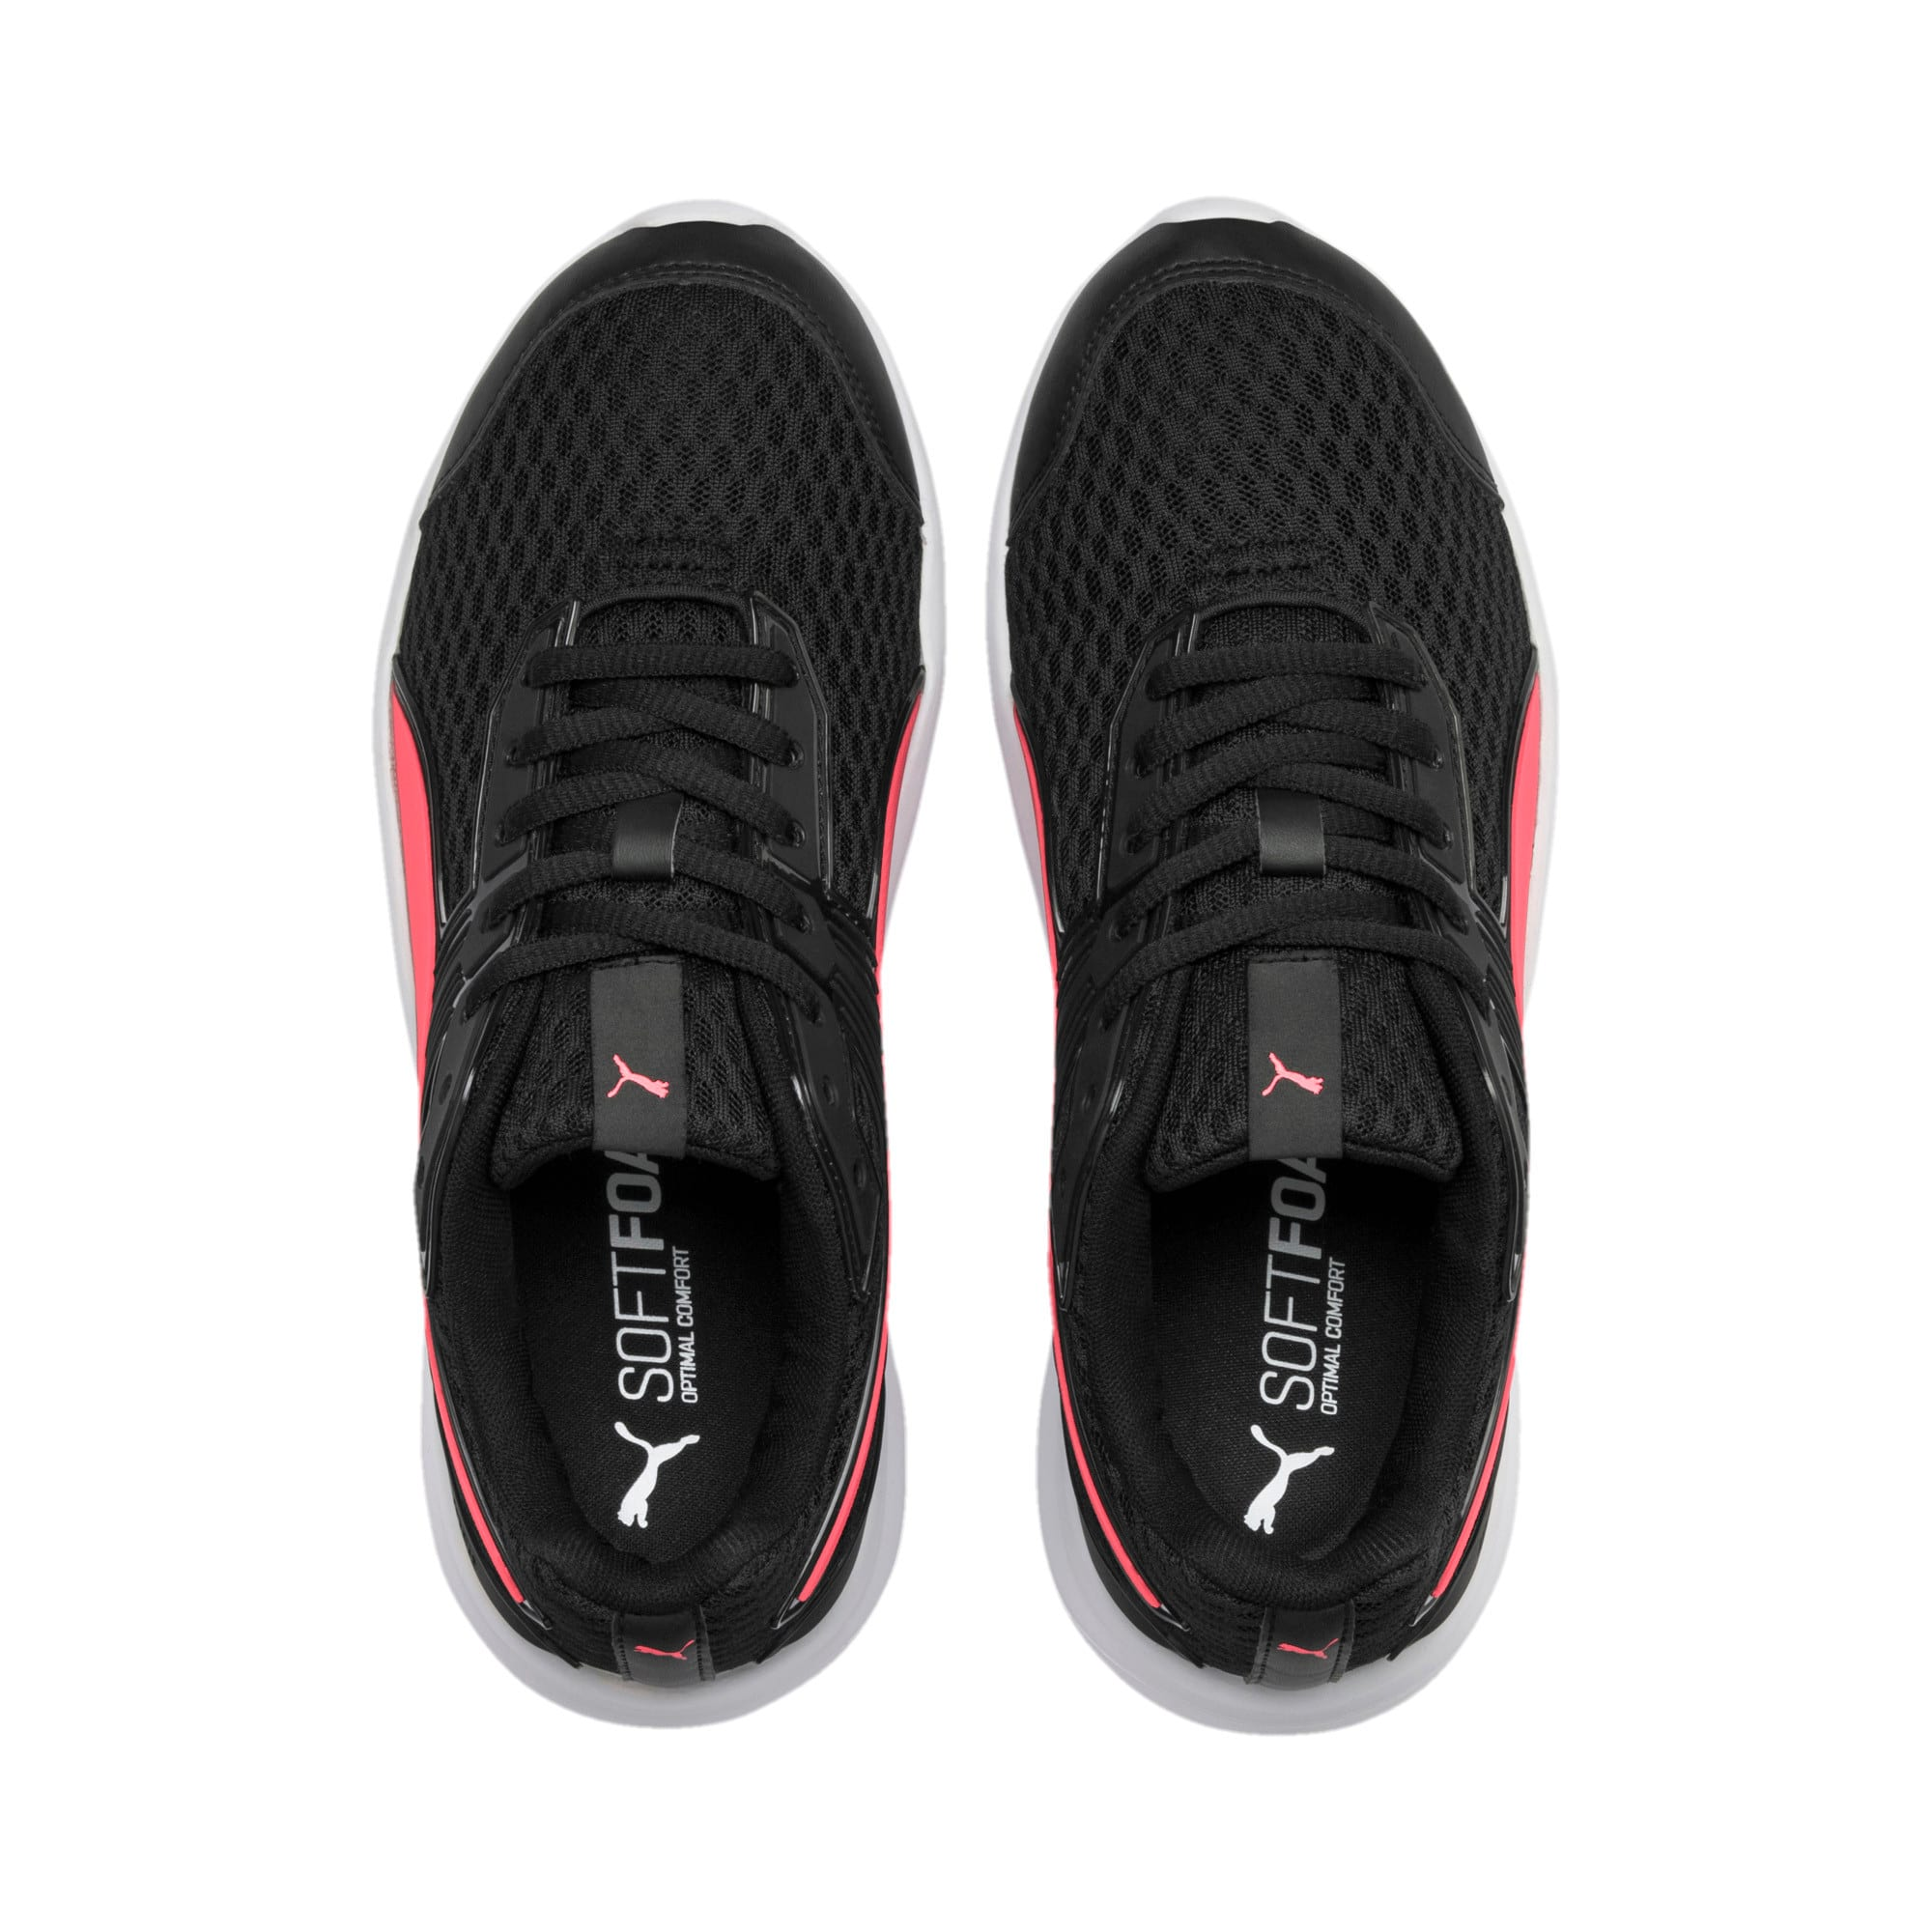 Thumbnail 2 of Escaper Pro Training Shoes, Black-Calypso Coral-White, medium-IND